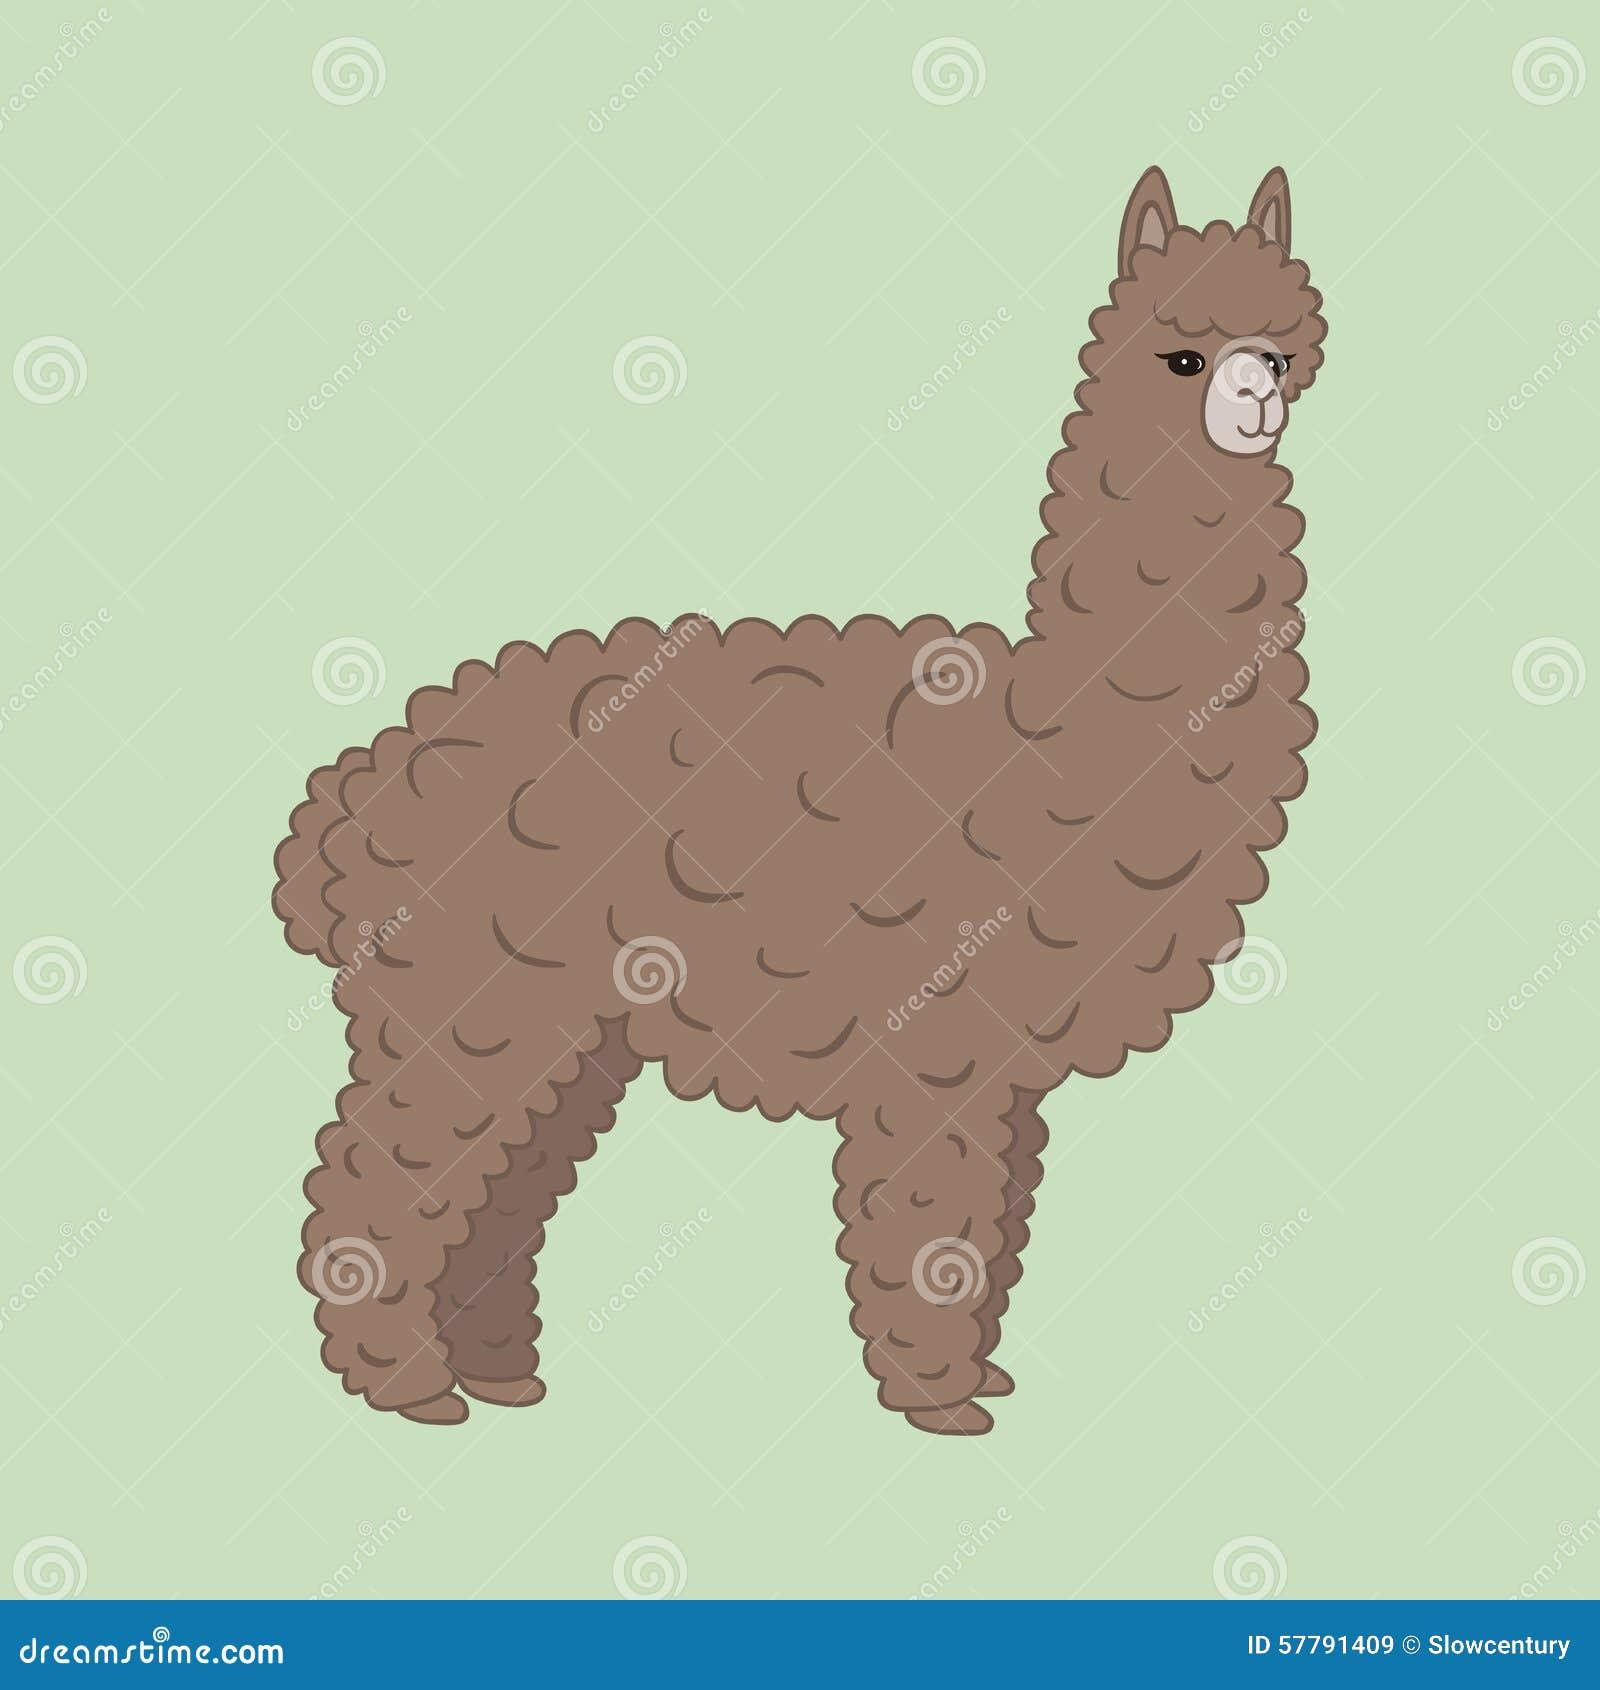 Cute Furry Brown Alpaca Stock Vector - Image: 57791409